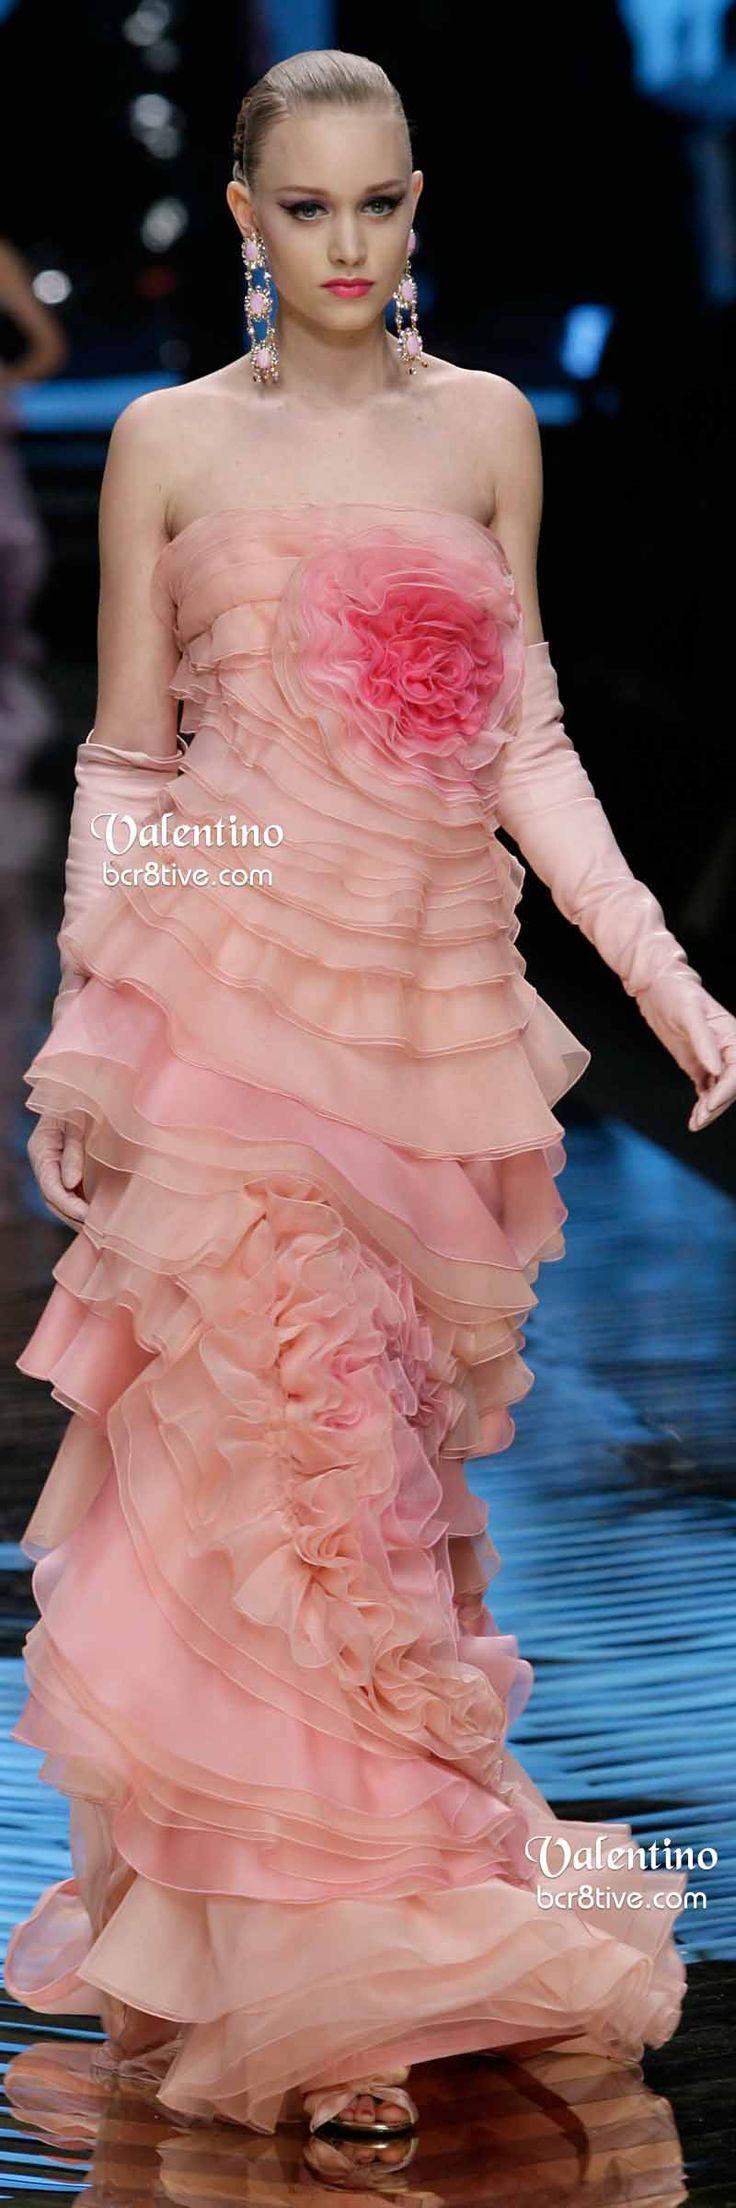 Mejores 72 imágenes de Valentino en Pinterest | Alta costura ...